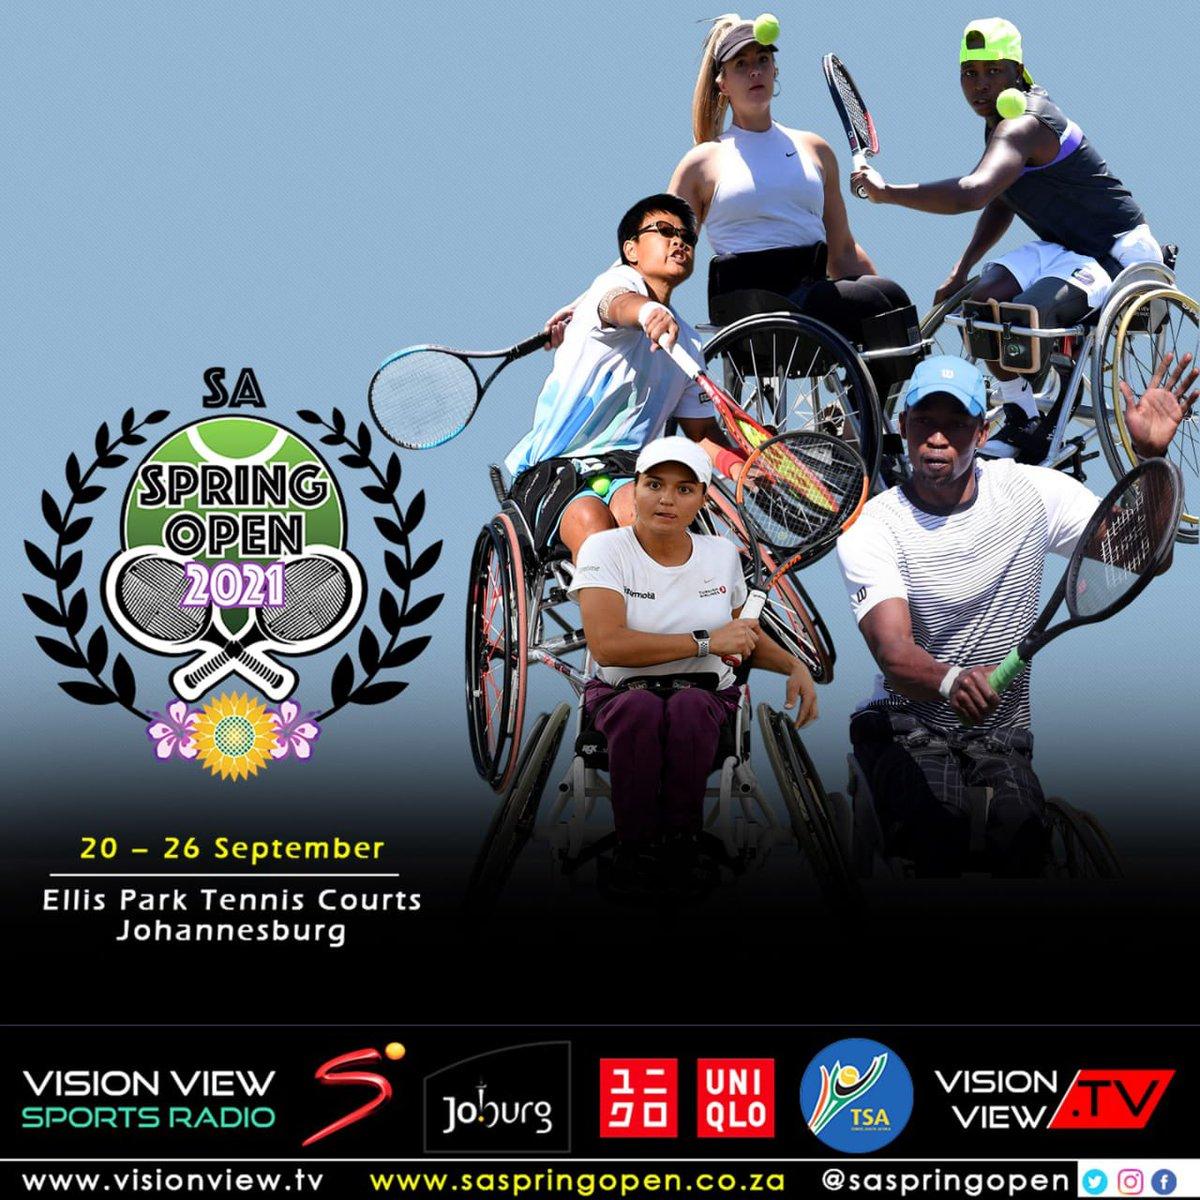 A few of the Wheelchair Tennis Grade II stars that will be taking part in this year's #SASpringOpen 🎾🌸 ▫️@KGmontjane1 ▫️@mventerofficial ▫️@Evansmaripa #SASO21 #SpringtimeTennis #Tennis4All